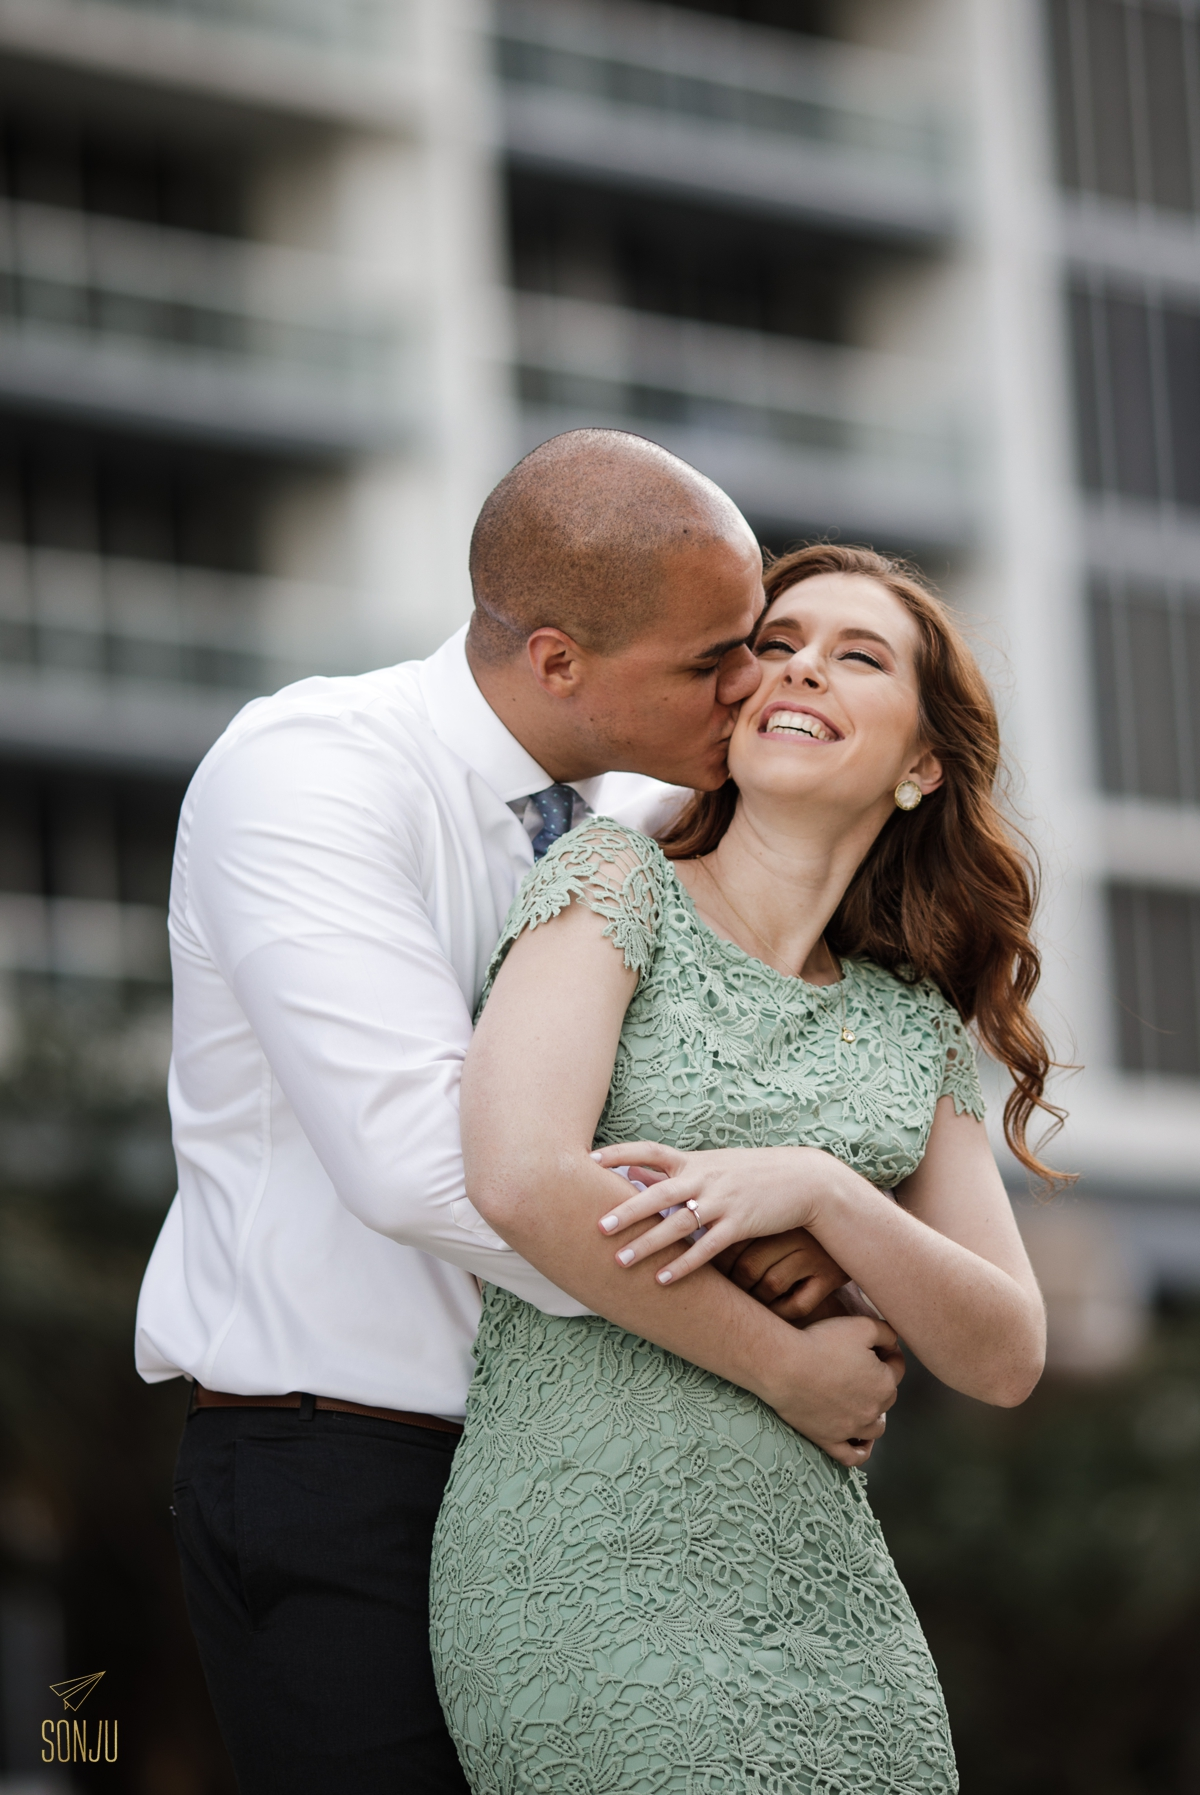 Miami-Engagement-Photographer-Brickell-Celina-Carlin-Sonju00006.jpg